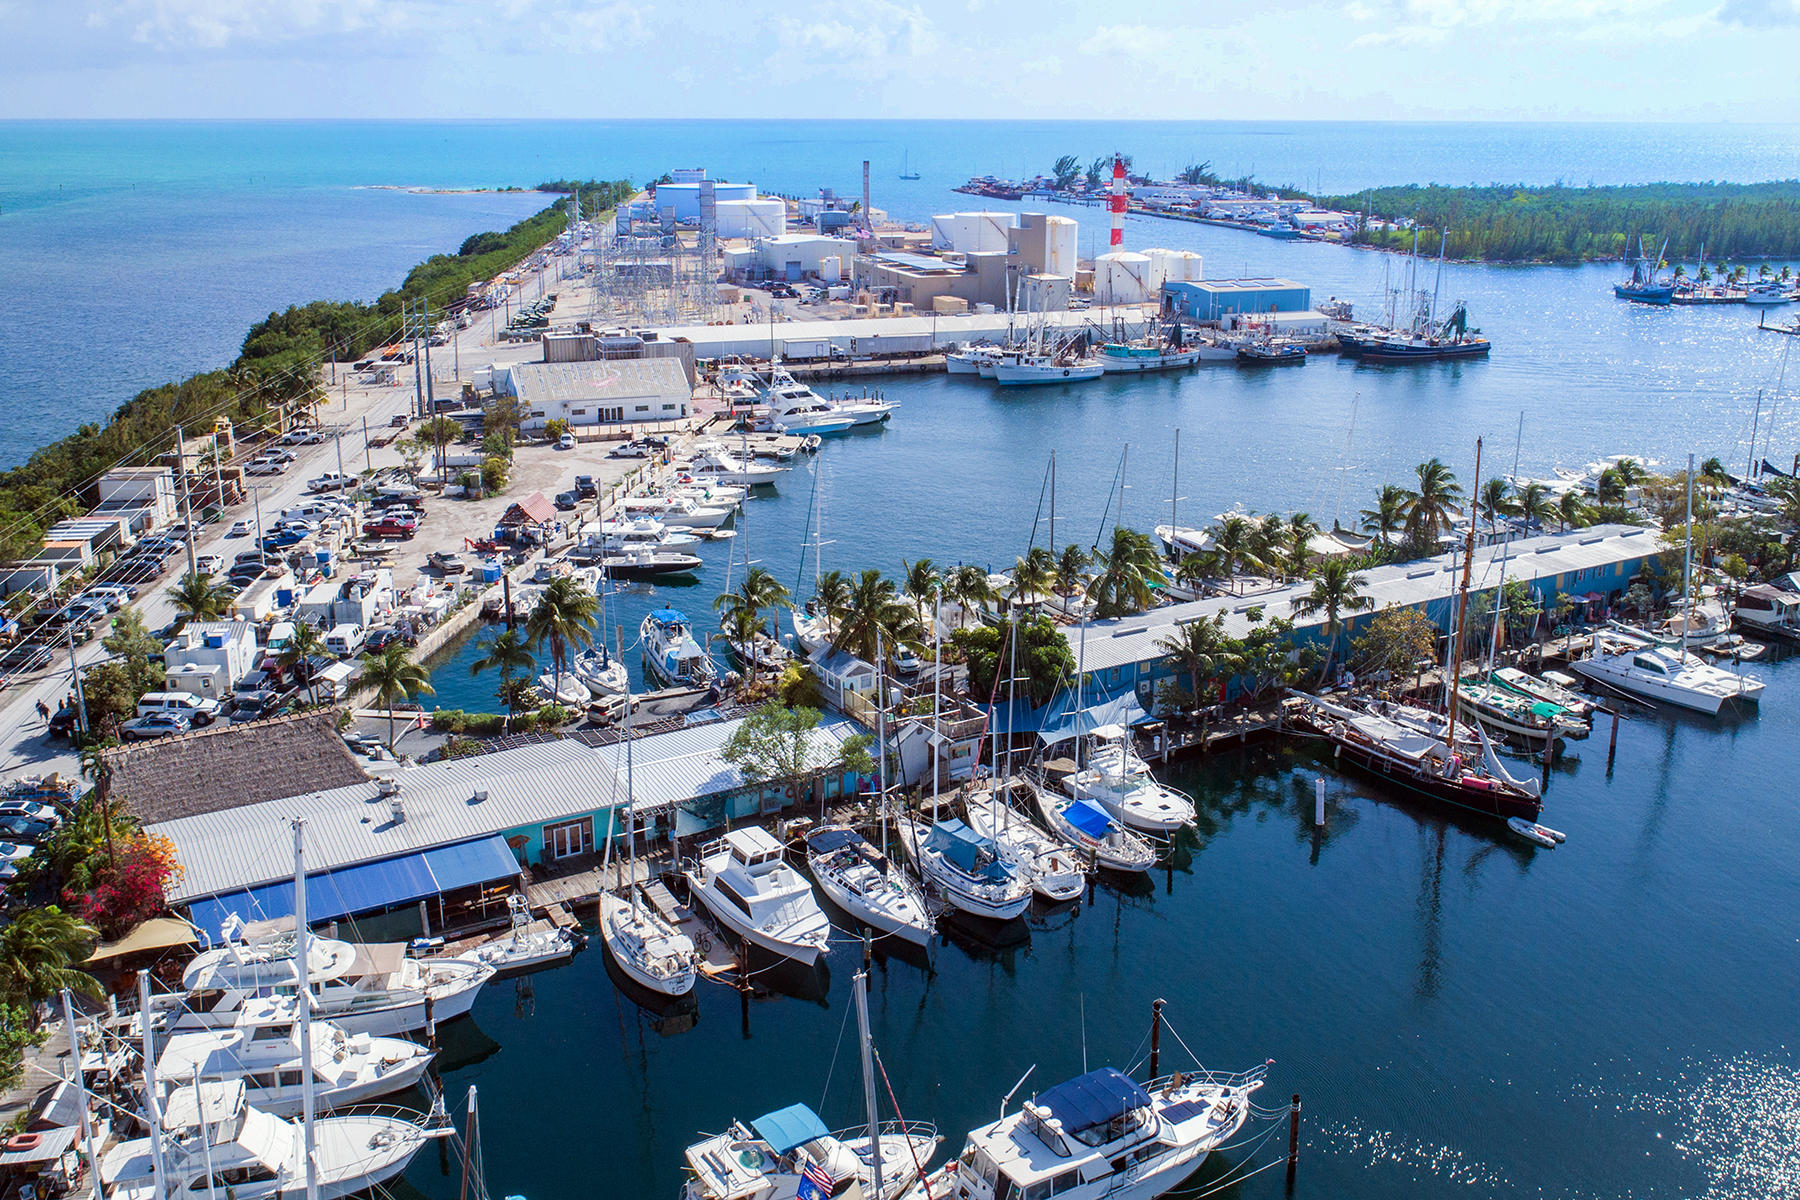 6810 Front Street, Key West, Florida 33040, 2 Bedrooms Bedrooms, ,2 BathroomsBathrooms,Condo/Coop,For Sale,Front,1,RX-10509961